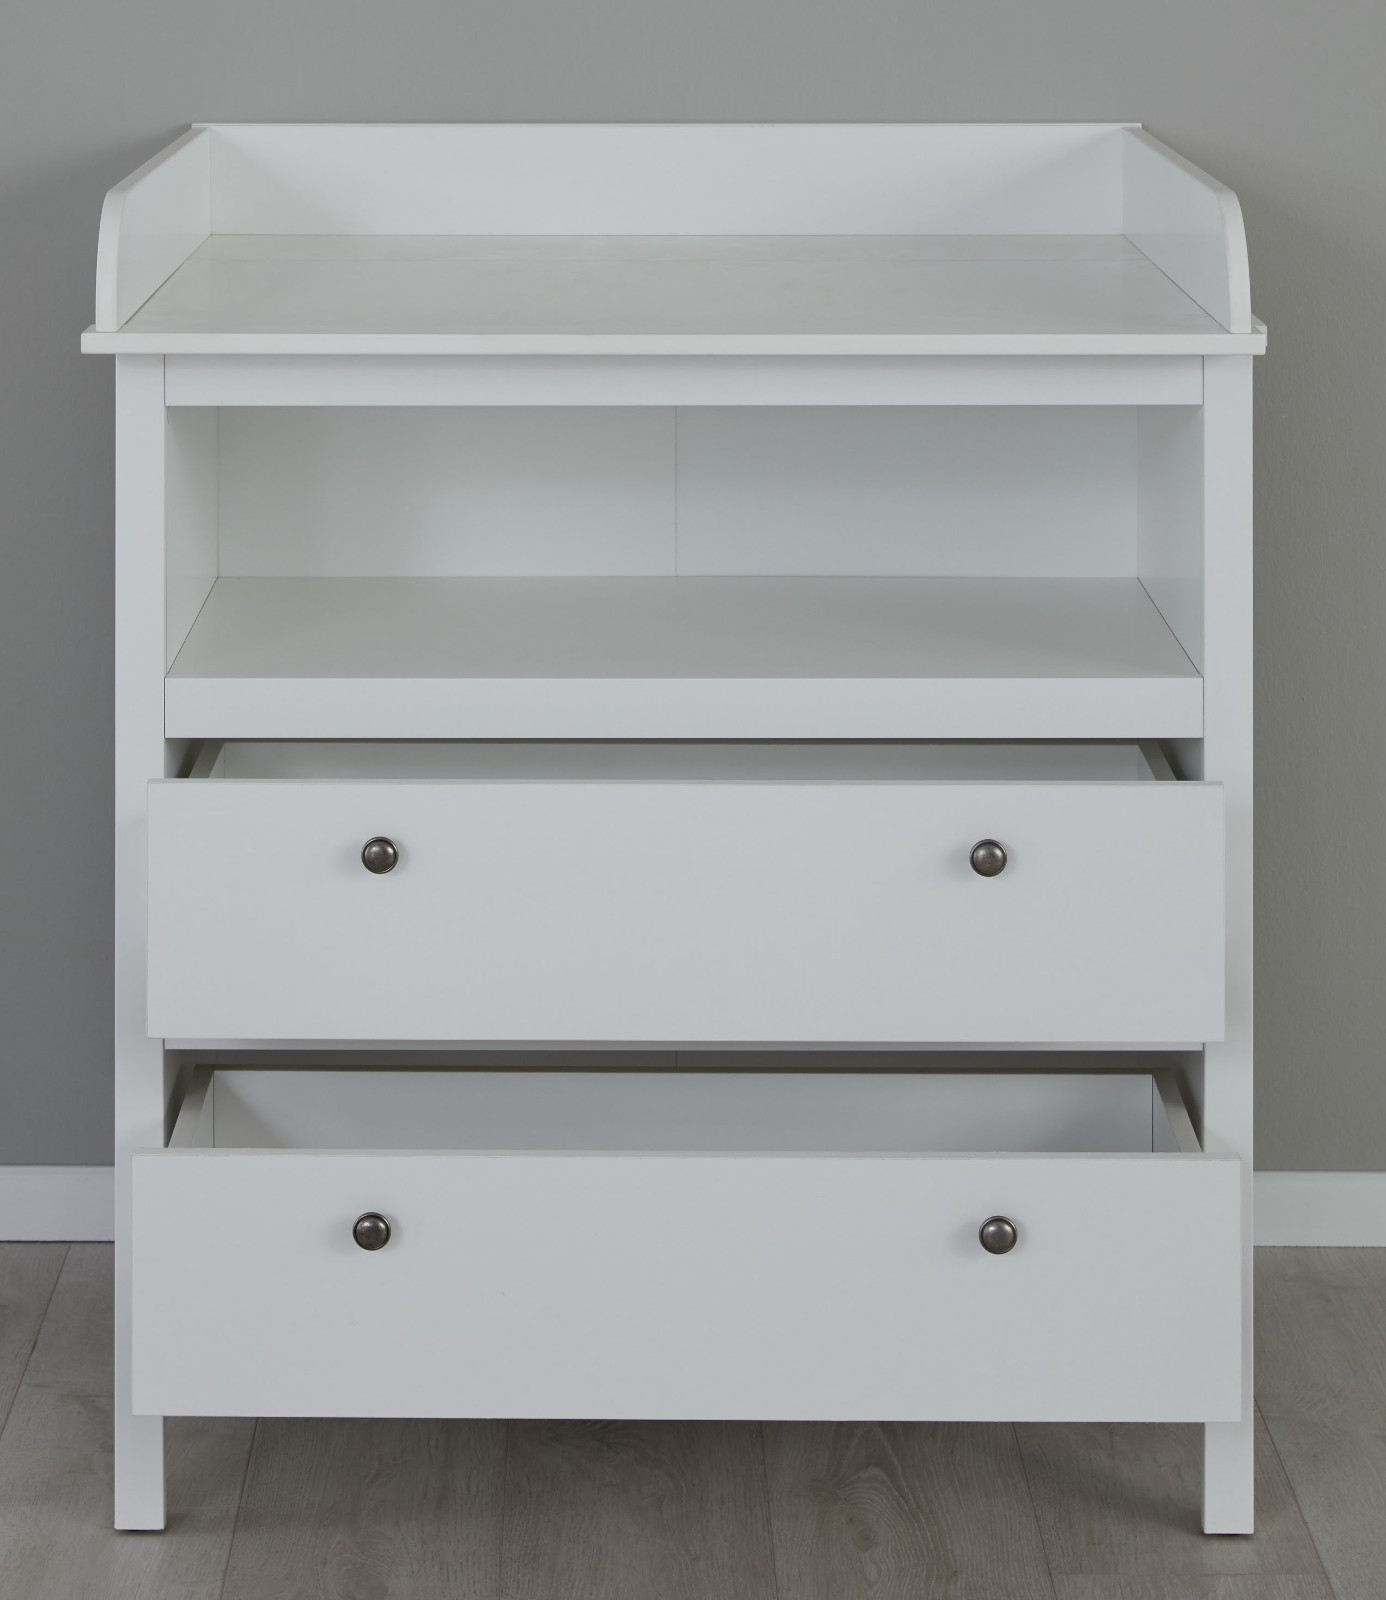 babyzimmer wickelkommode ole wei. Black Bedroom Furniture Sets. Home Design Ideas